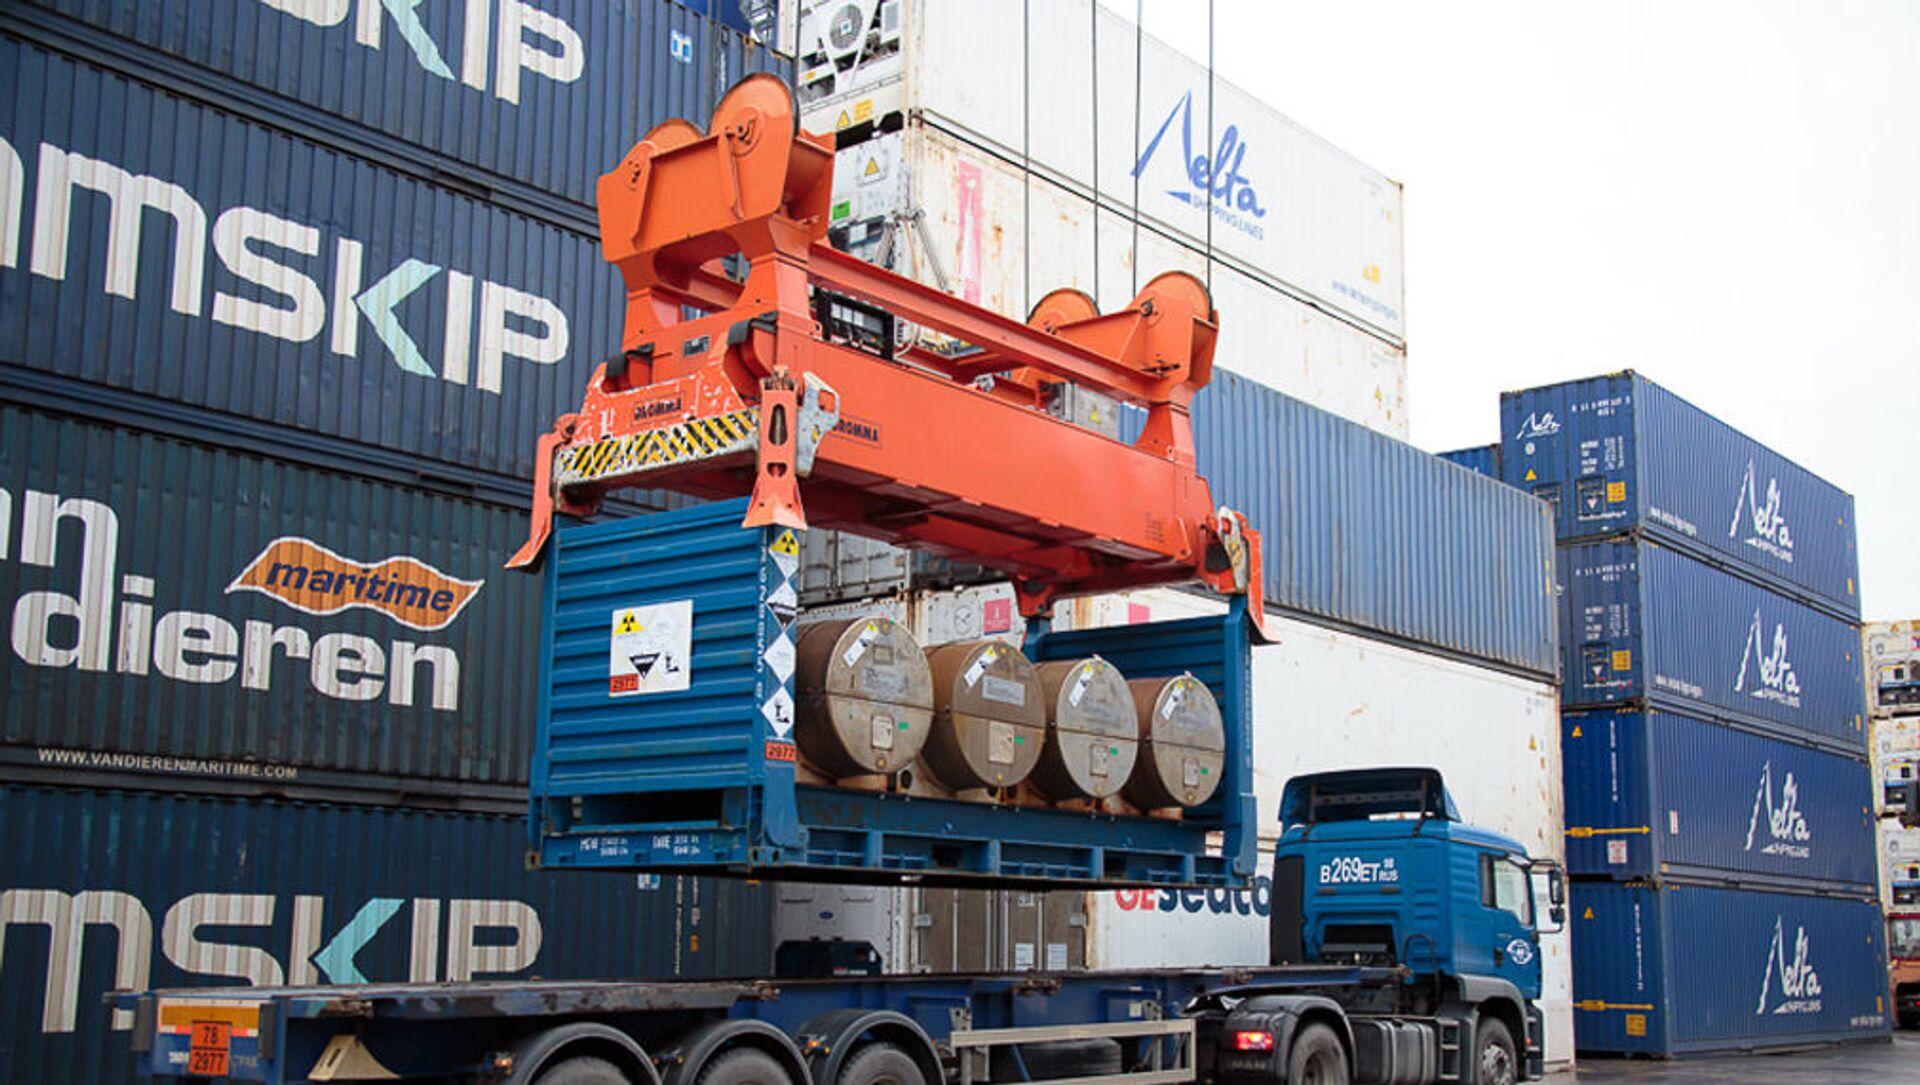 Container tại cảng Saint-Petersburg - Sputnik Việt Nam, 1920, 01.03.2021